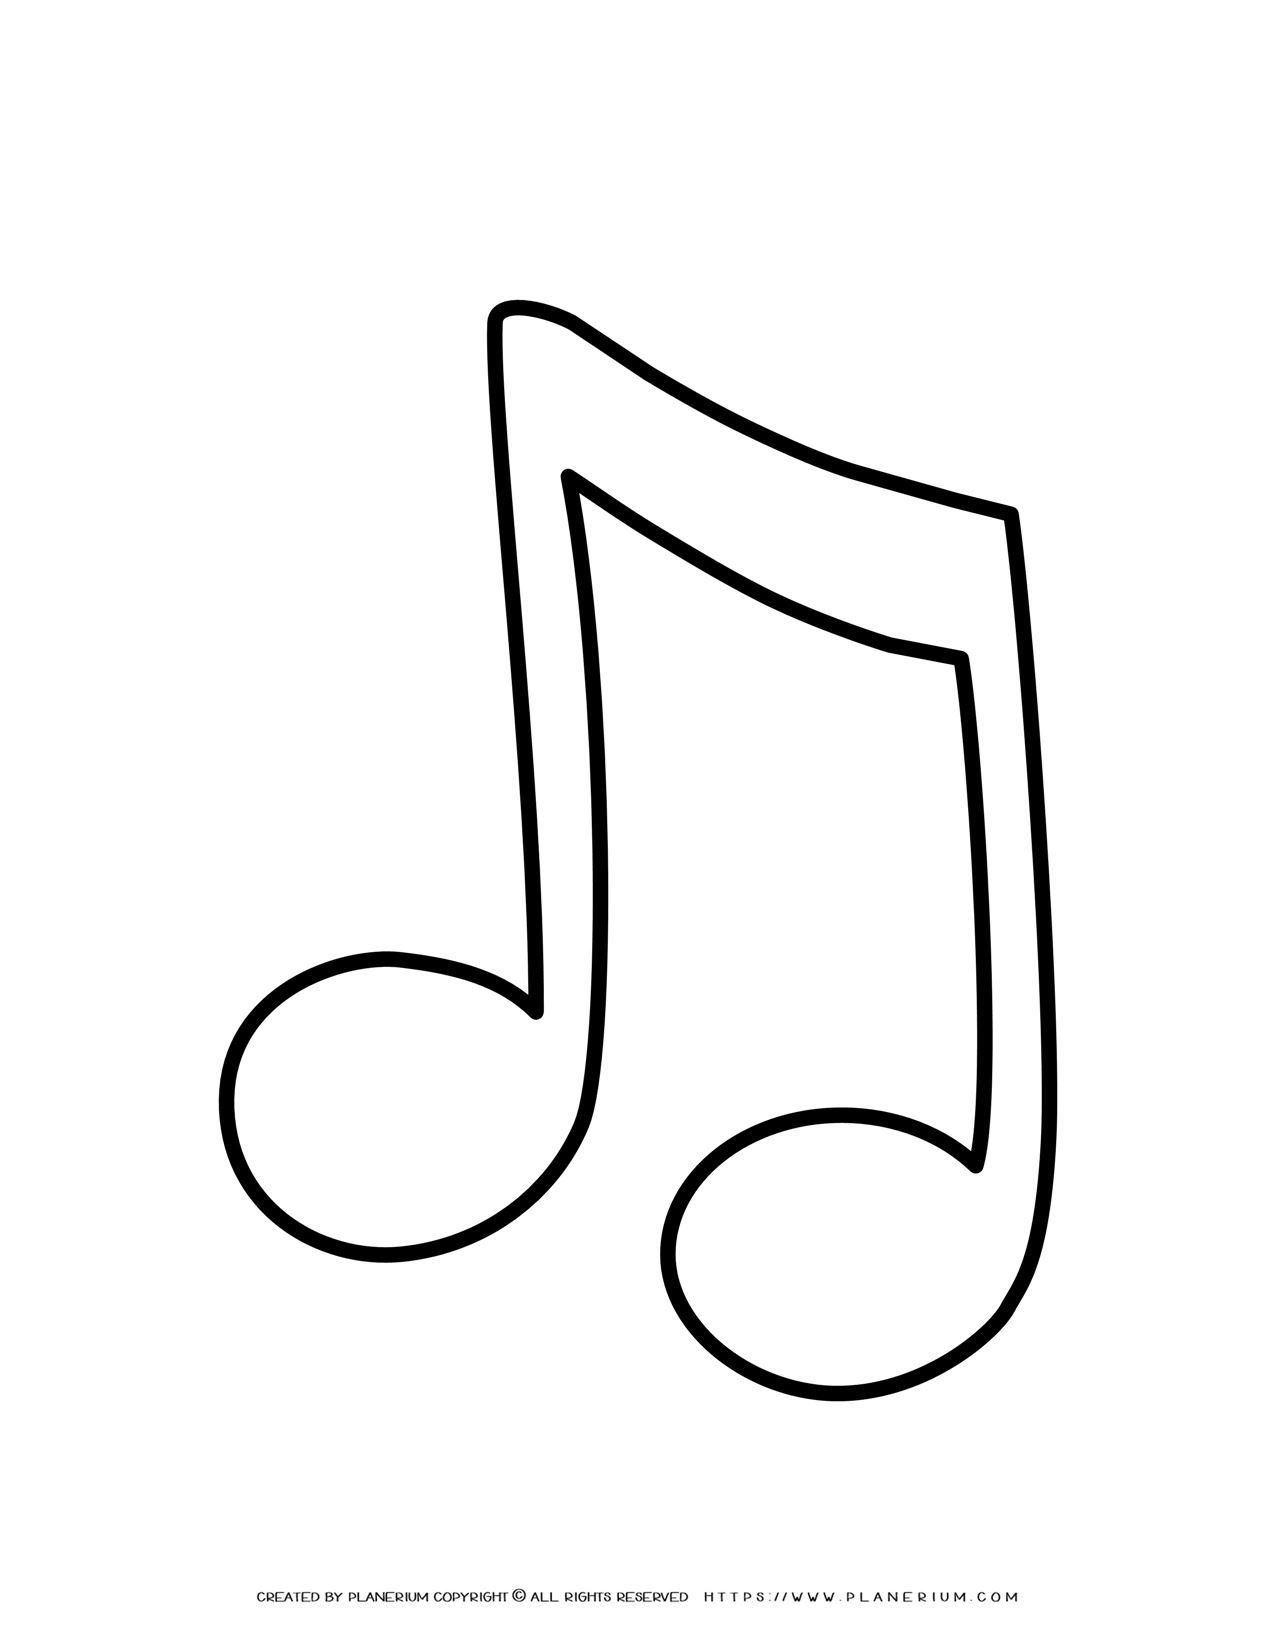 Music Note Outline | Planerium